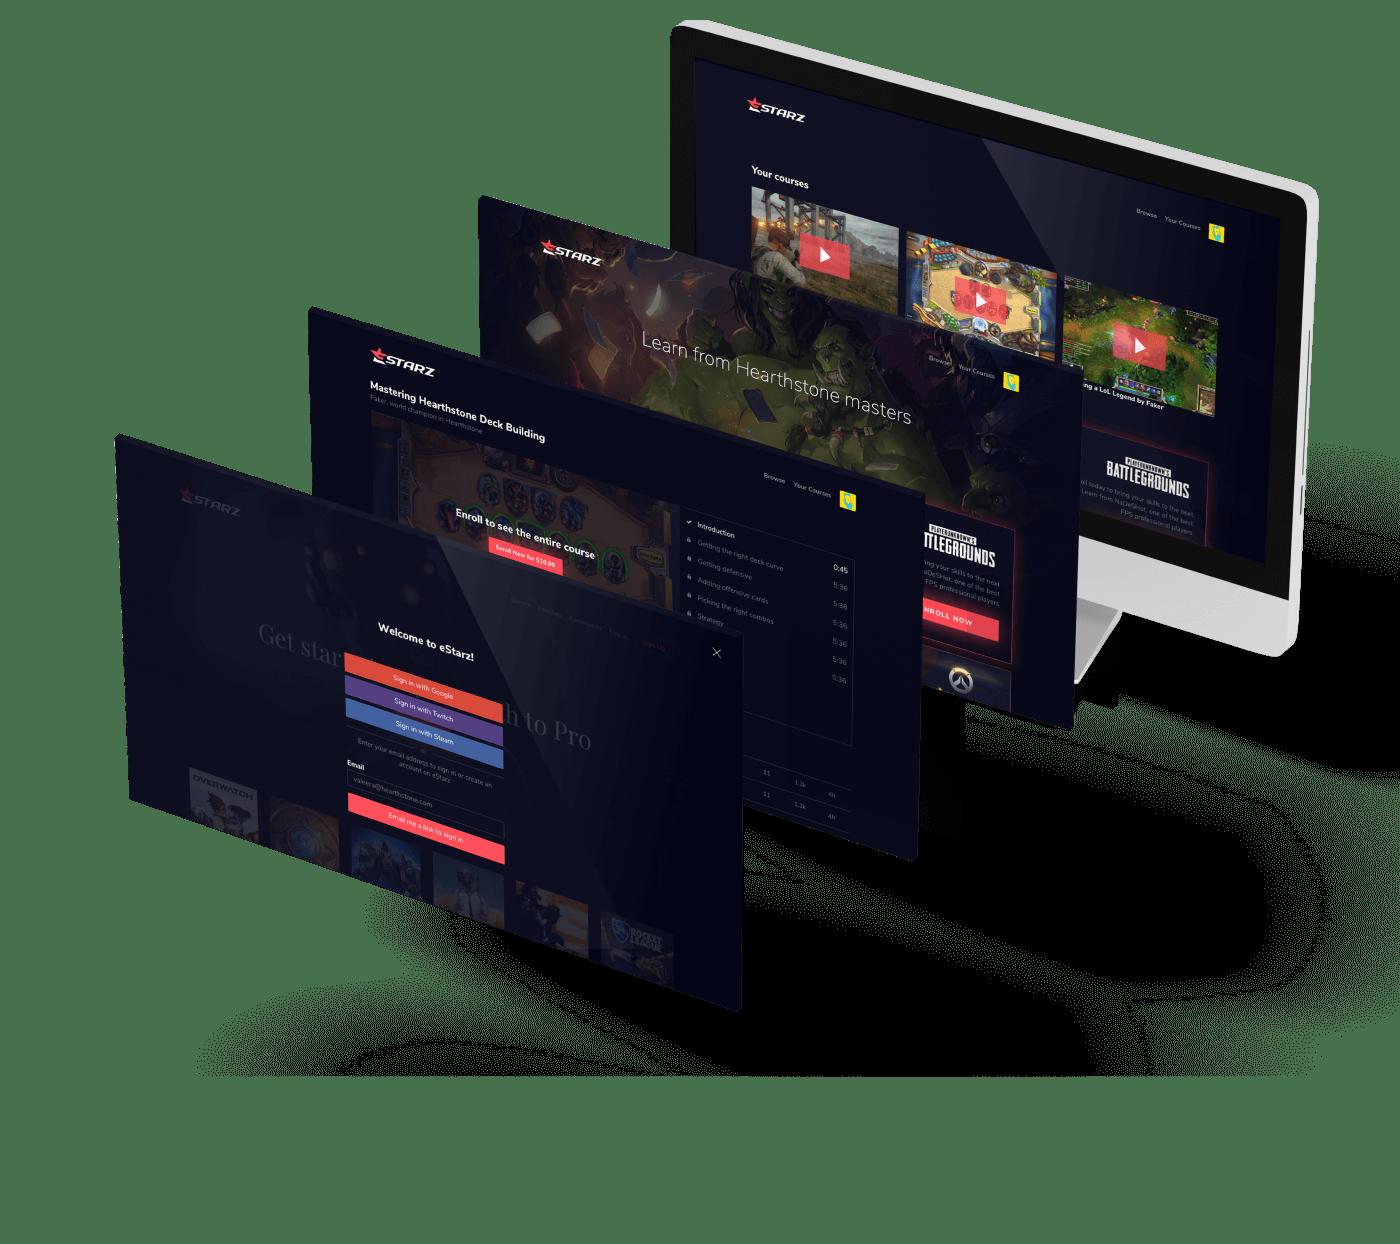 eStarz/Framerate coaching platform